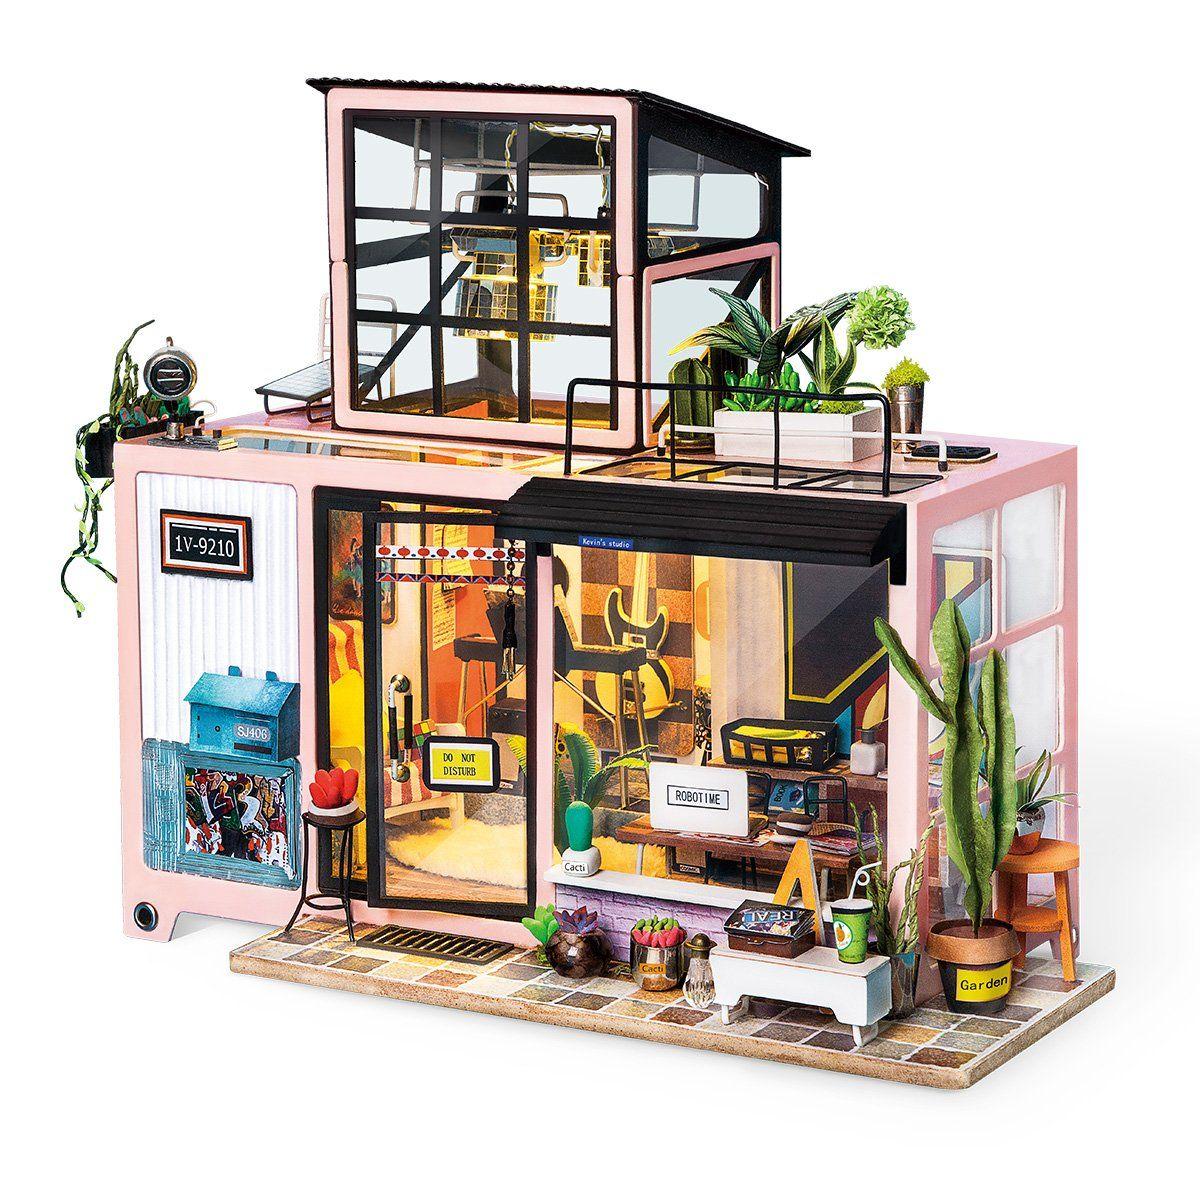 Kevin's Studio Robotime DIY Miniature Dollhouse Kit